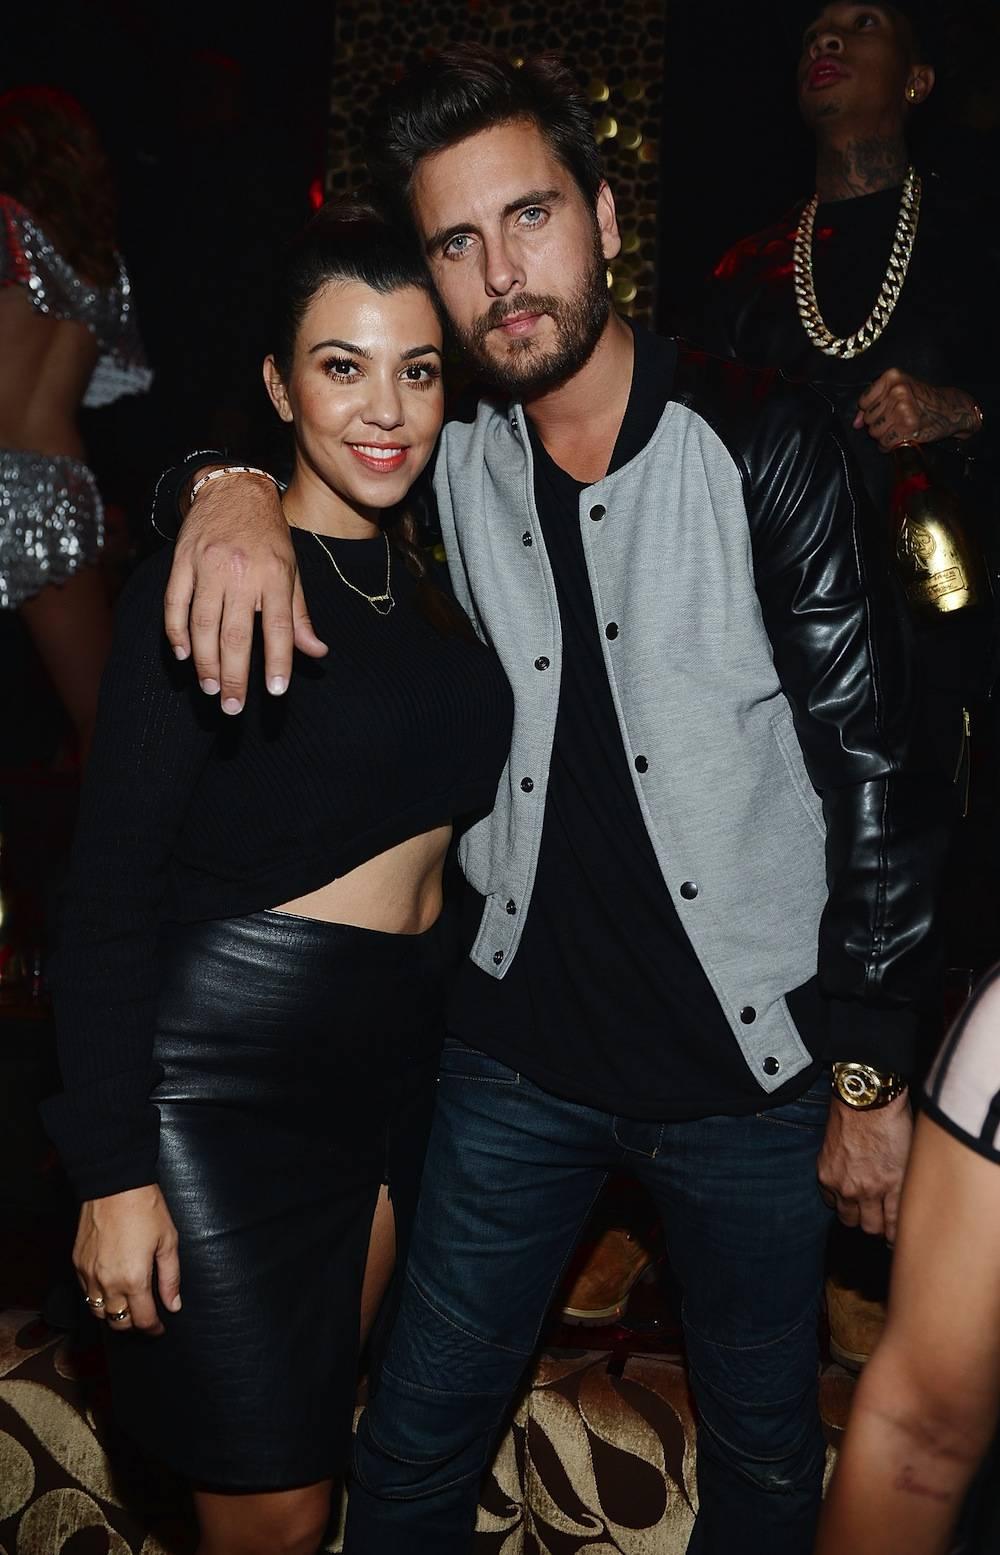 Kim Kardashian Celebrates Her Birthday At Tao Las Vegas